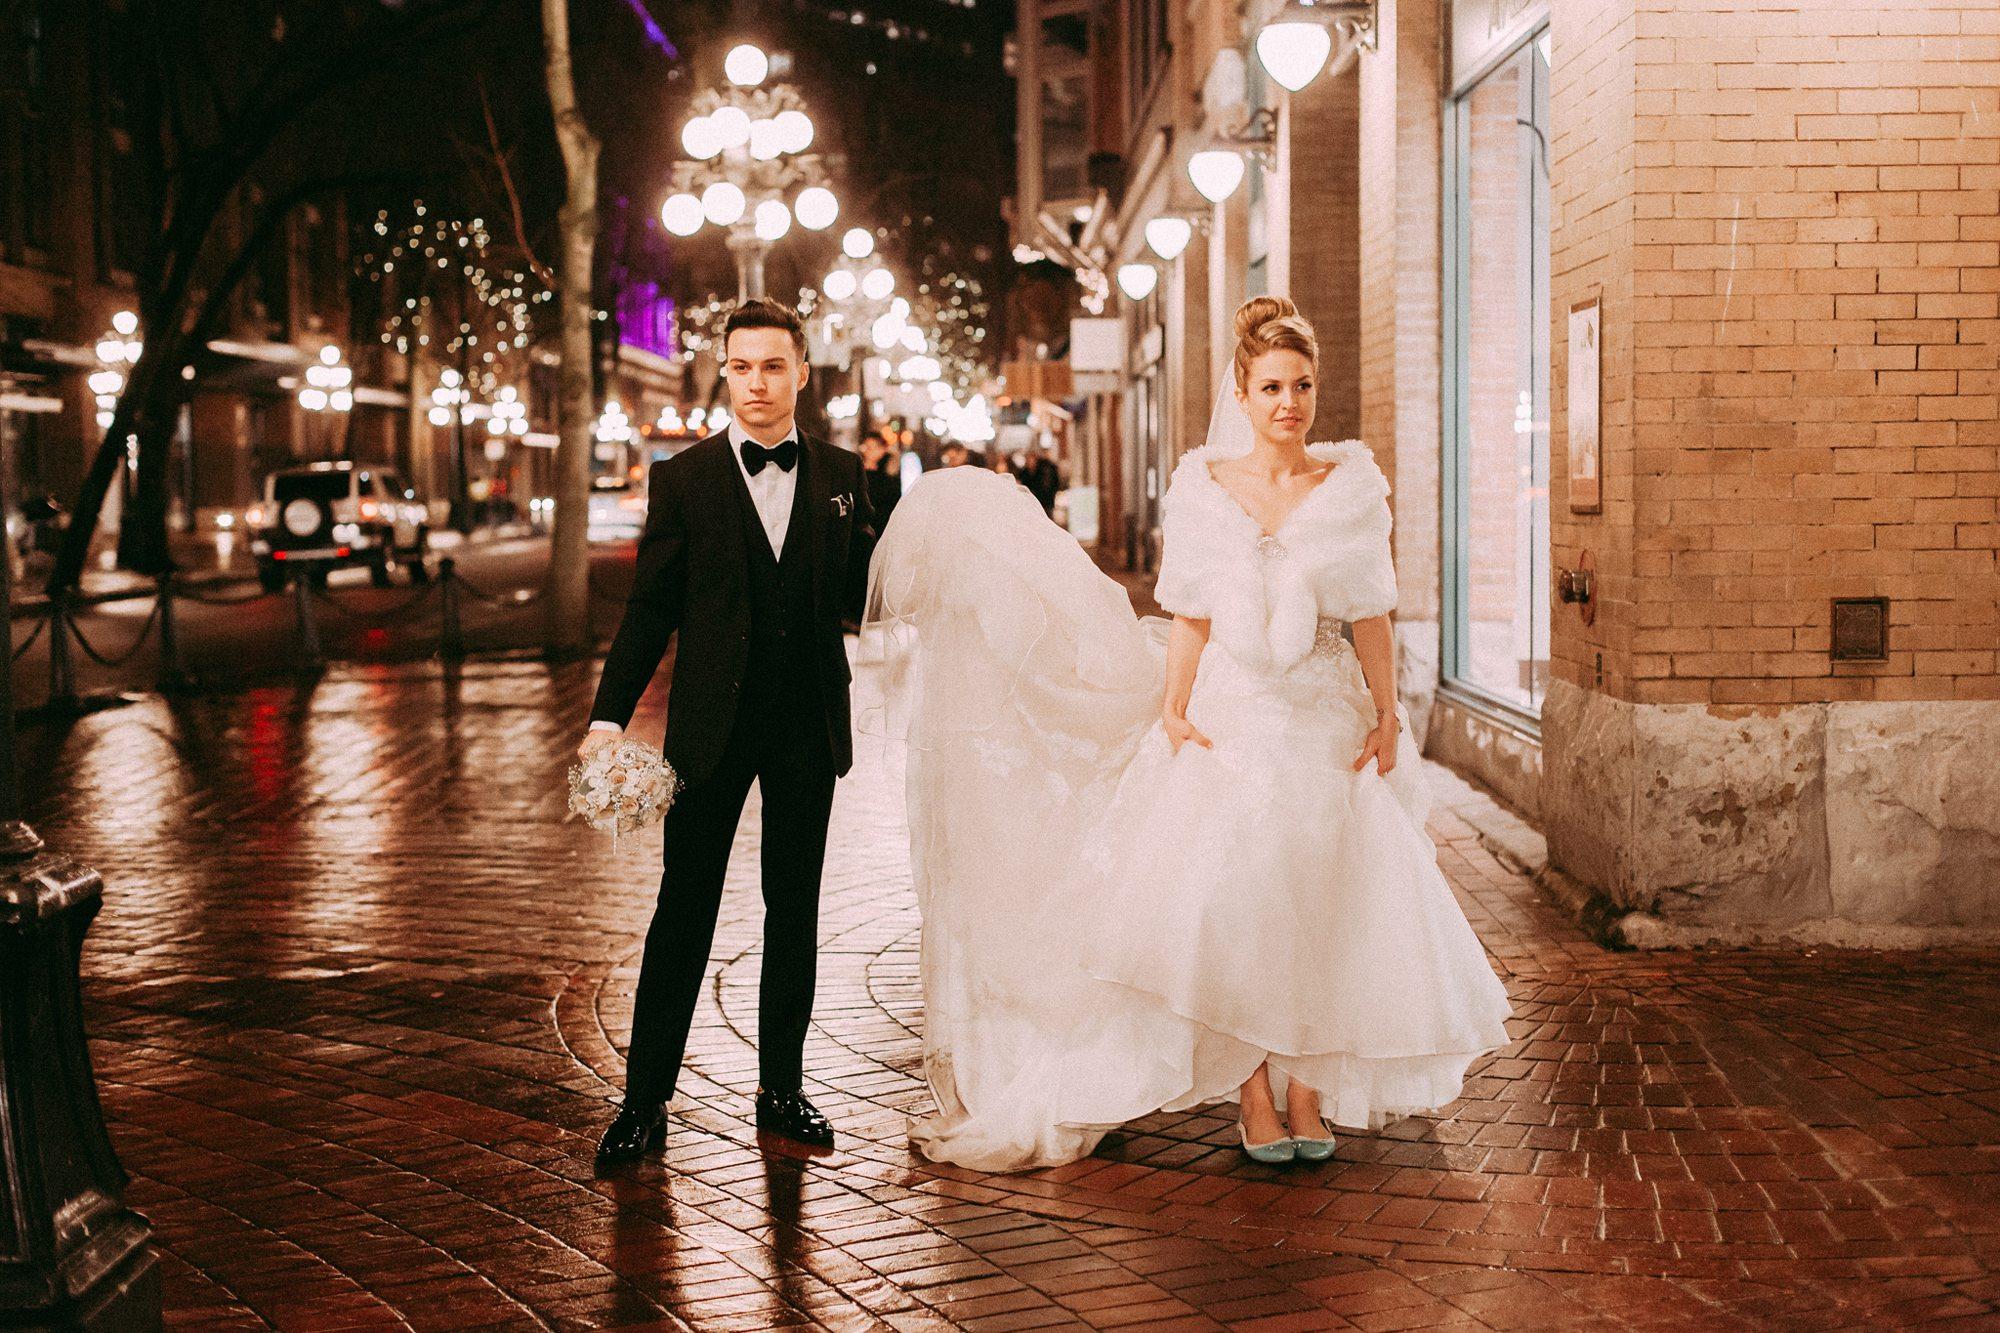 056-vancouver-wedding-photographer